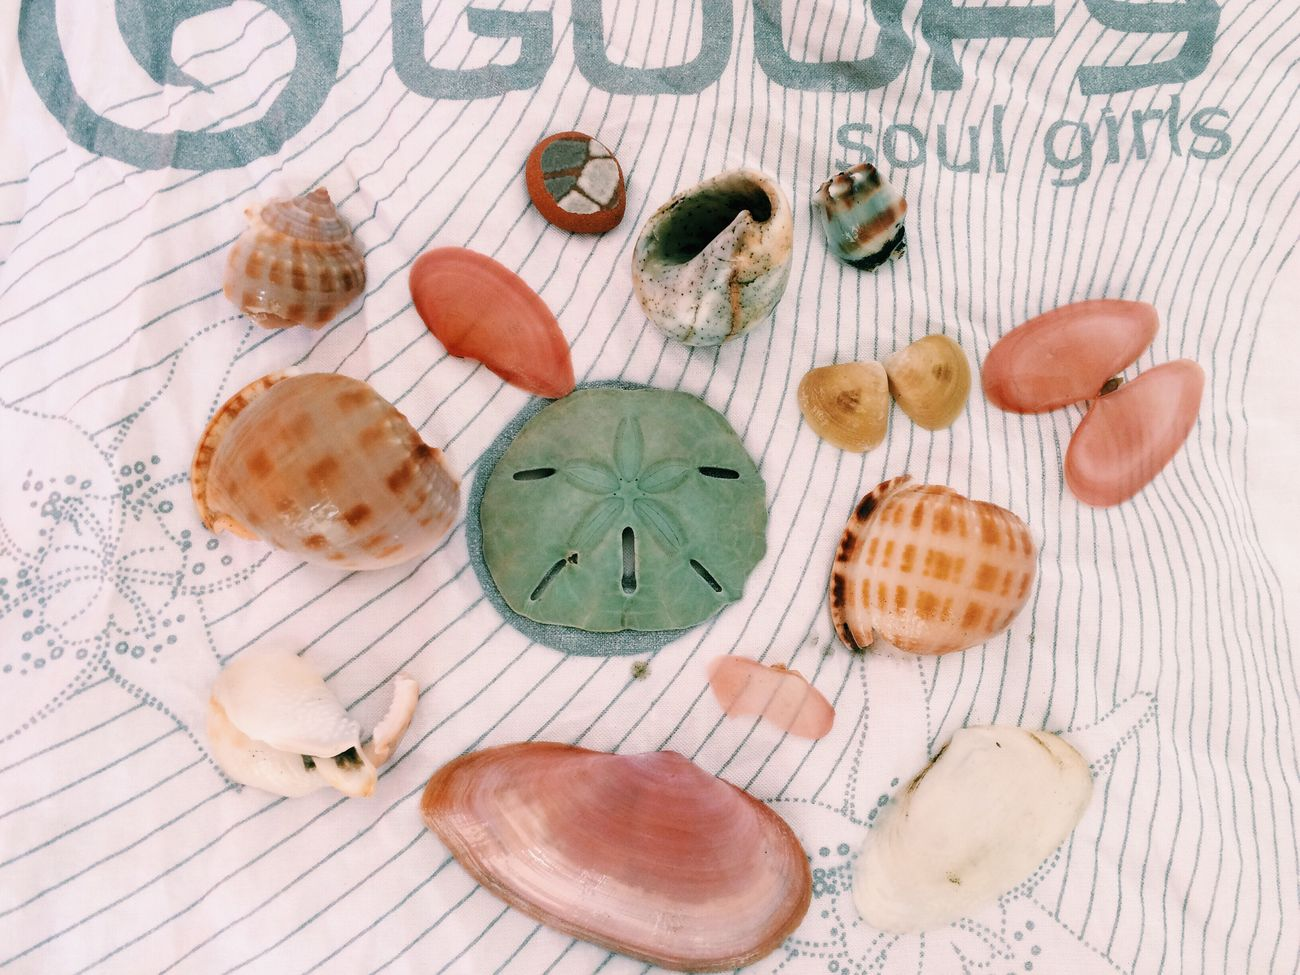 Nature's Diversities Seashells Seatreasure Mollusca Echinoidea Equinodermos Moluscos Bivalve Bolachadomar